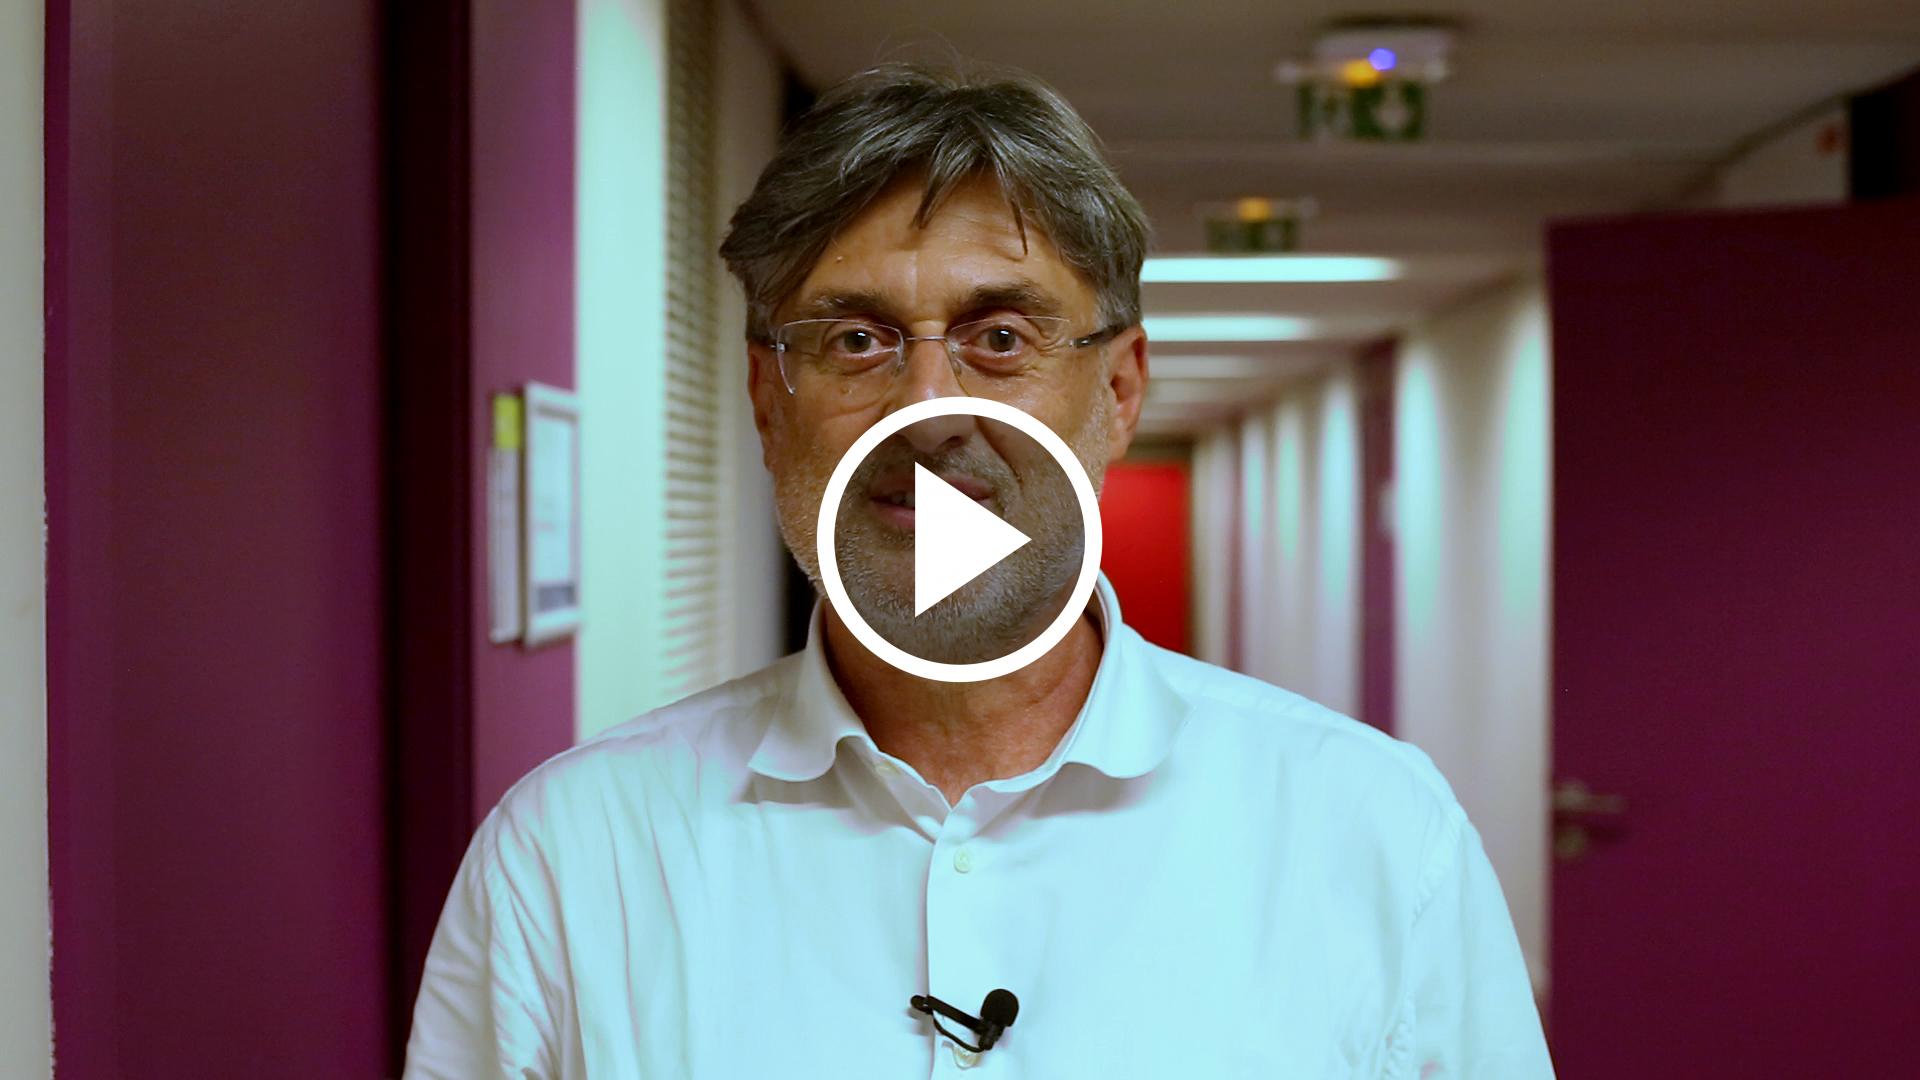 Bernardo Magnini, Fondazione Bruno Kessler